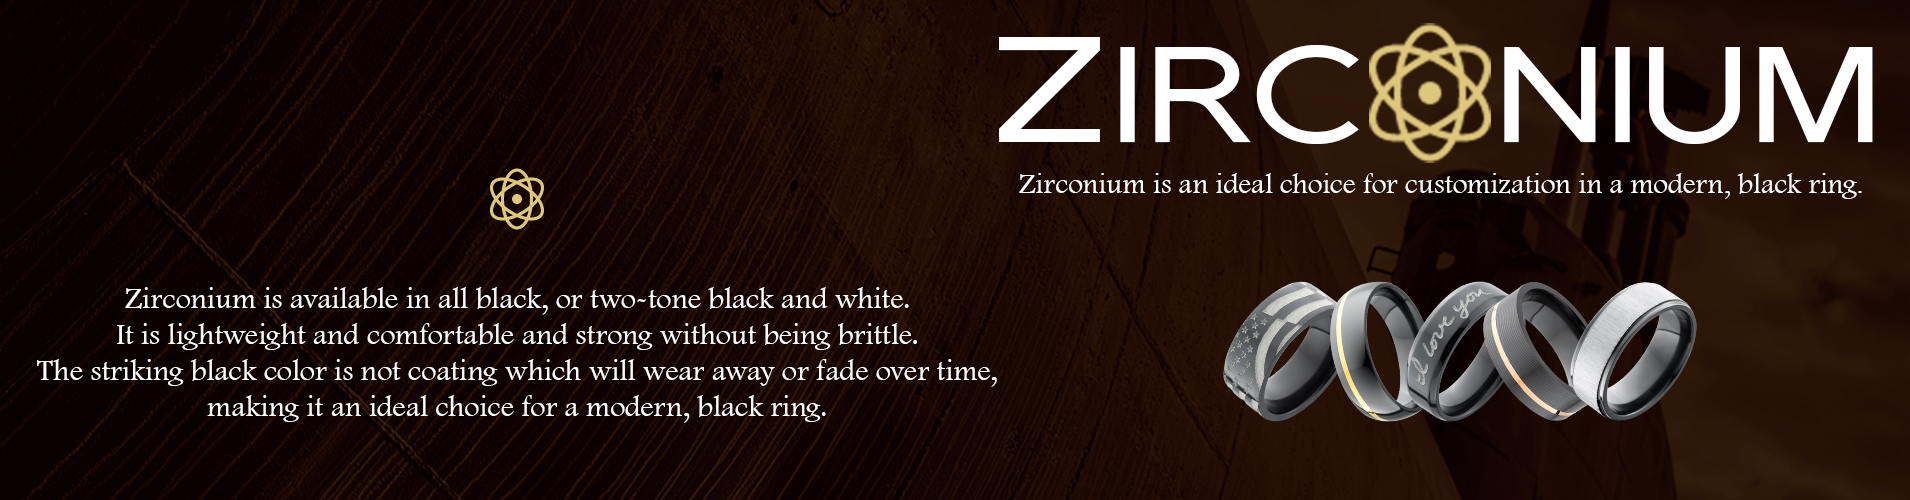 Zirconium